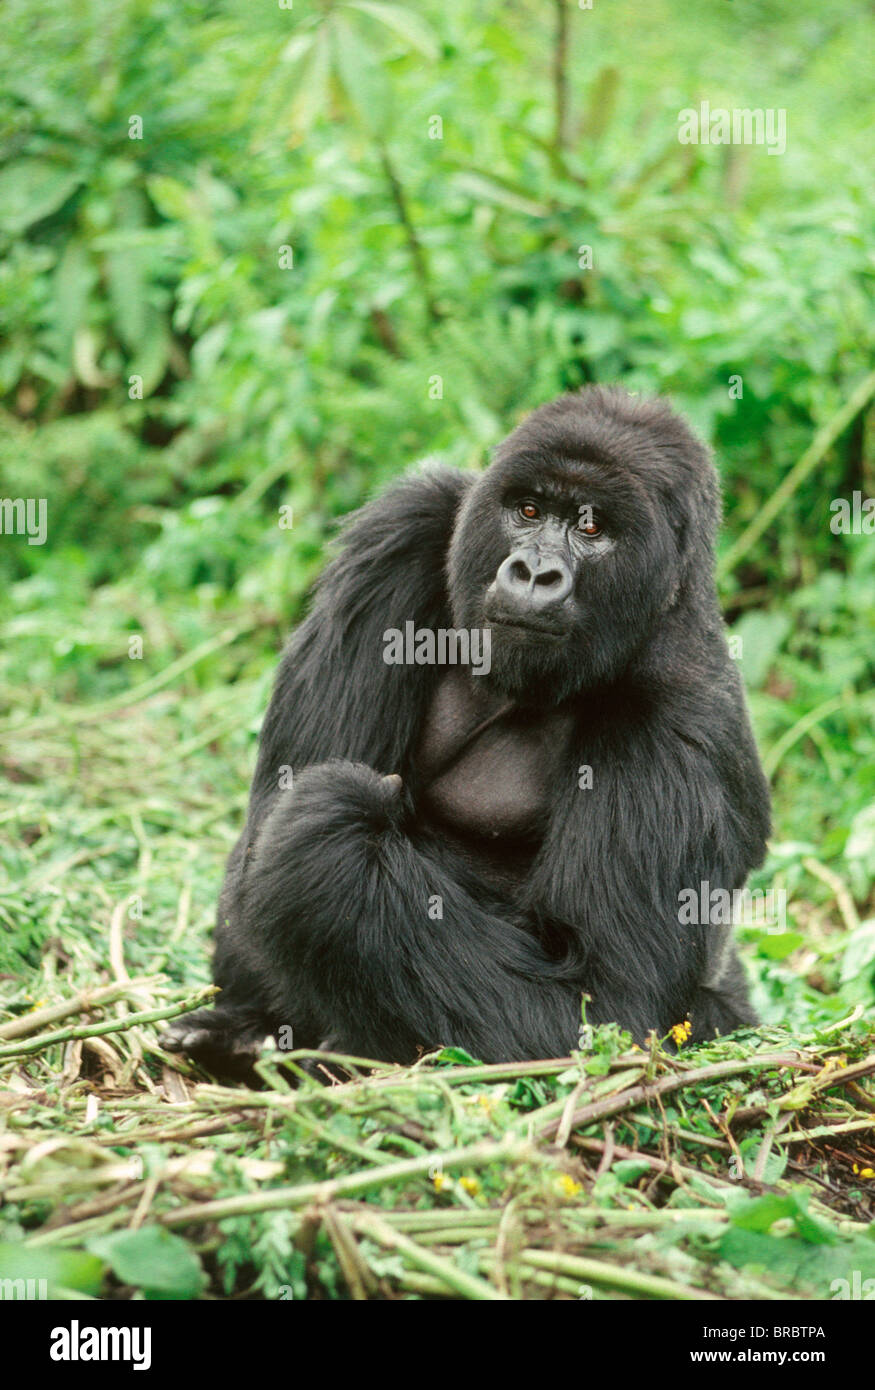 Mountain Gorilla (Gorilla gorilla beringei) silverback male, Virunga Volcanoes, Rwanda - Stock Image